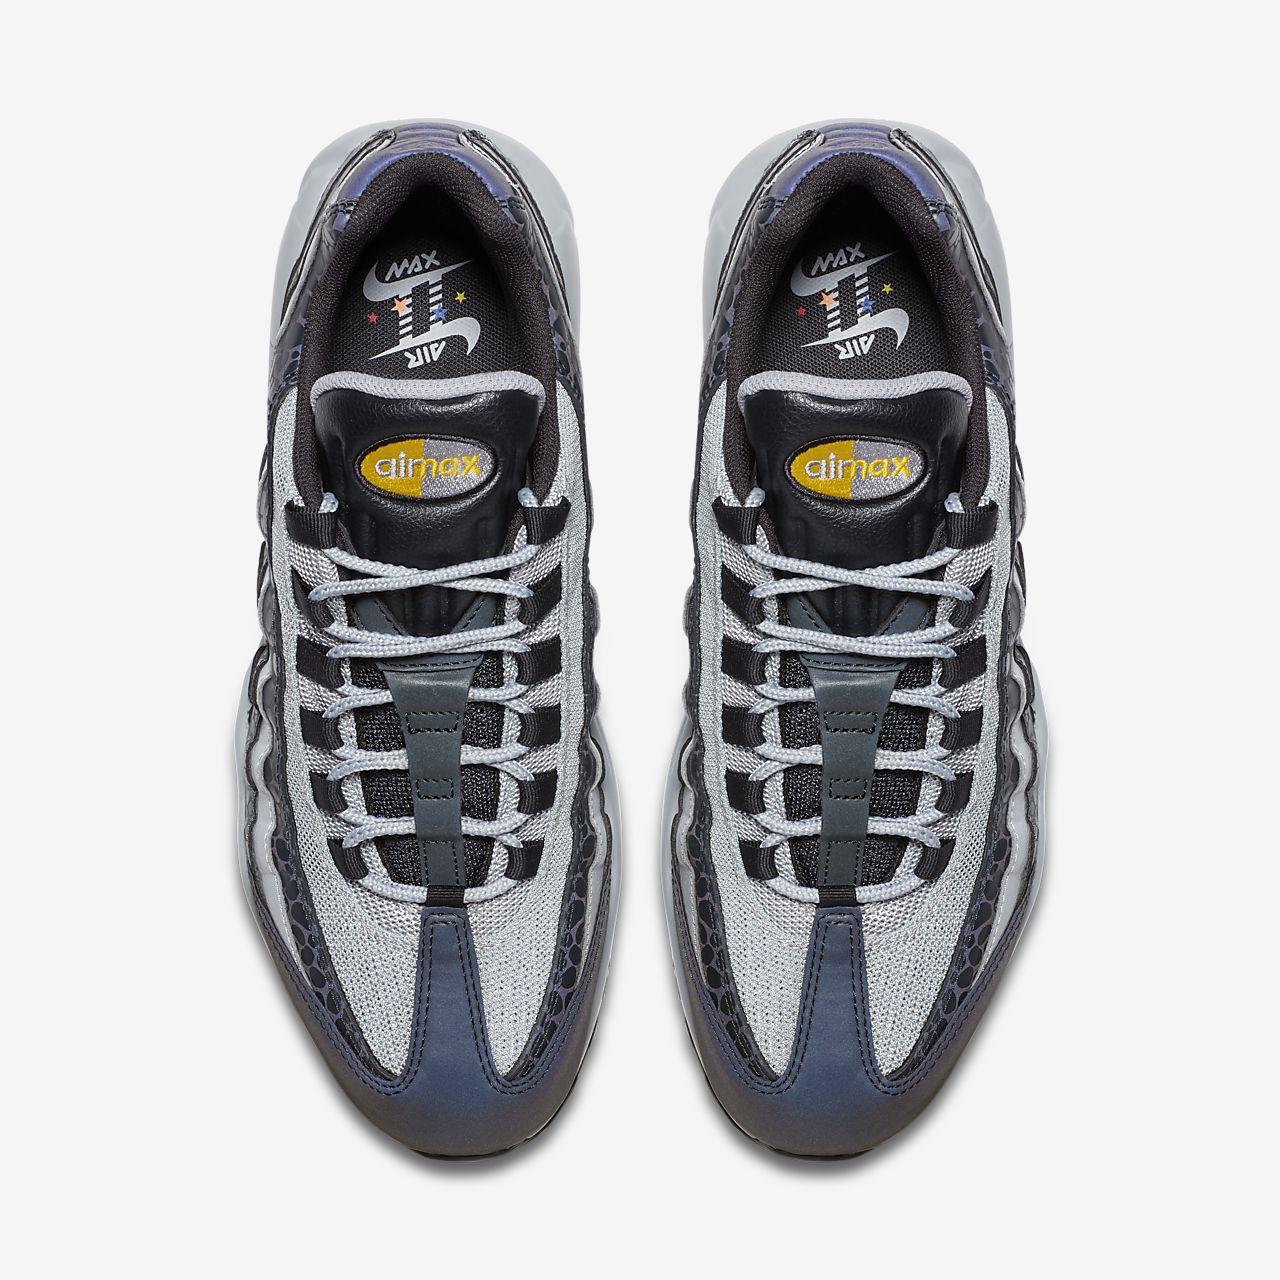 189567a4ad59 Nike Air Max 95 SE Men s Shoe. Nike.com AU